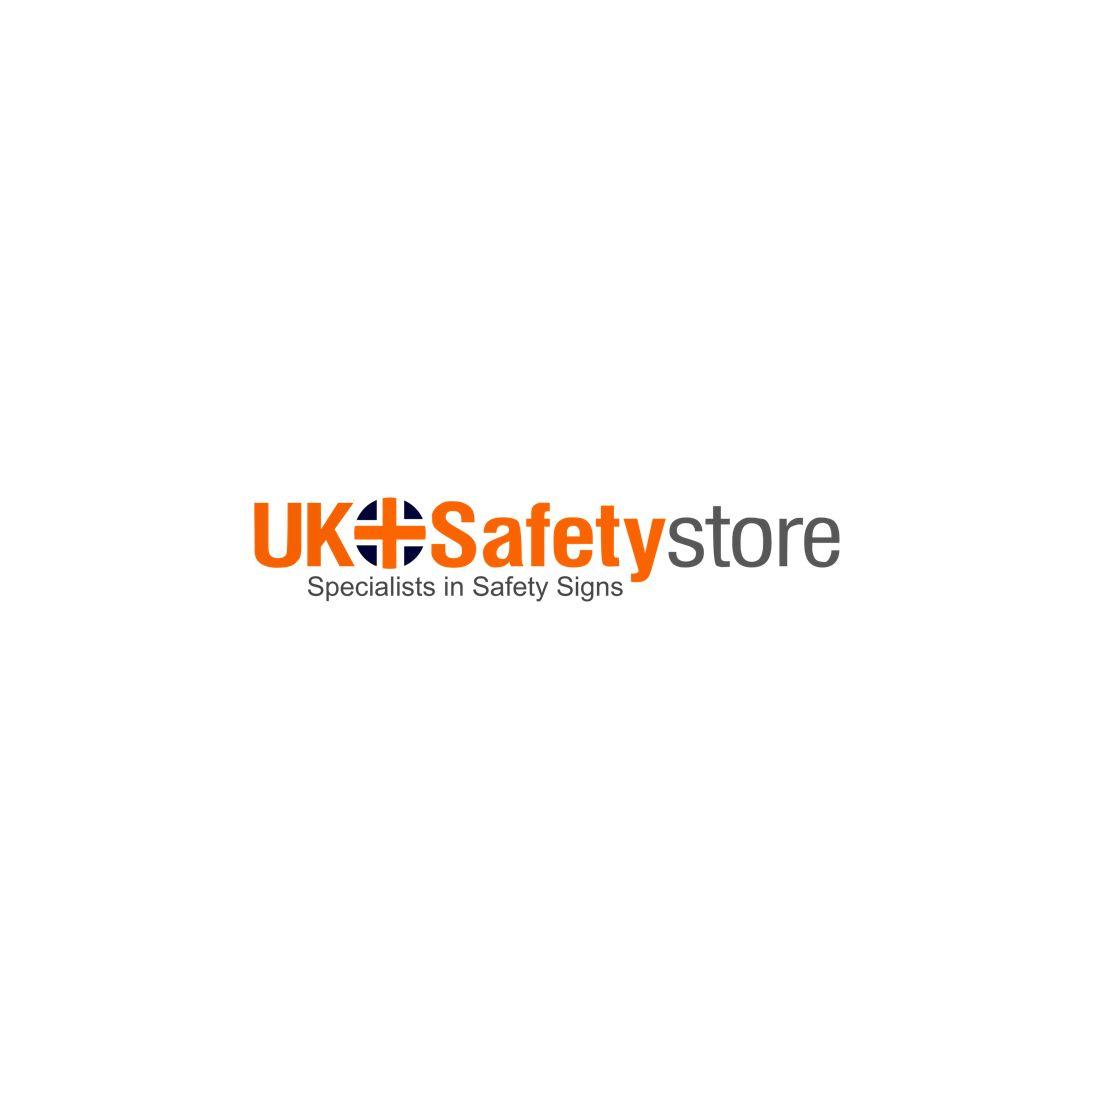 Danger Electric Shock Risk Safety Sign Safety Signs Uk Safety Store